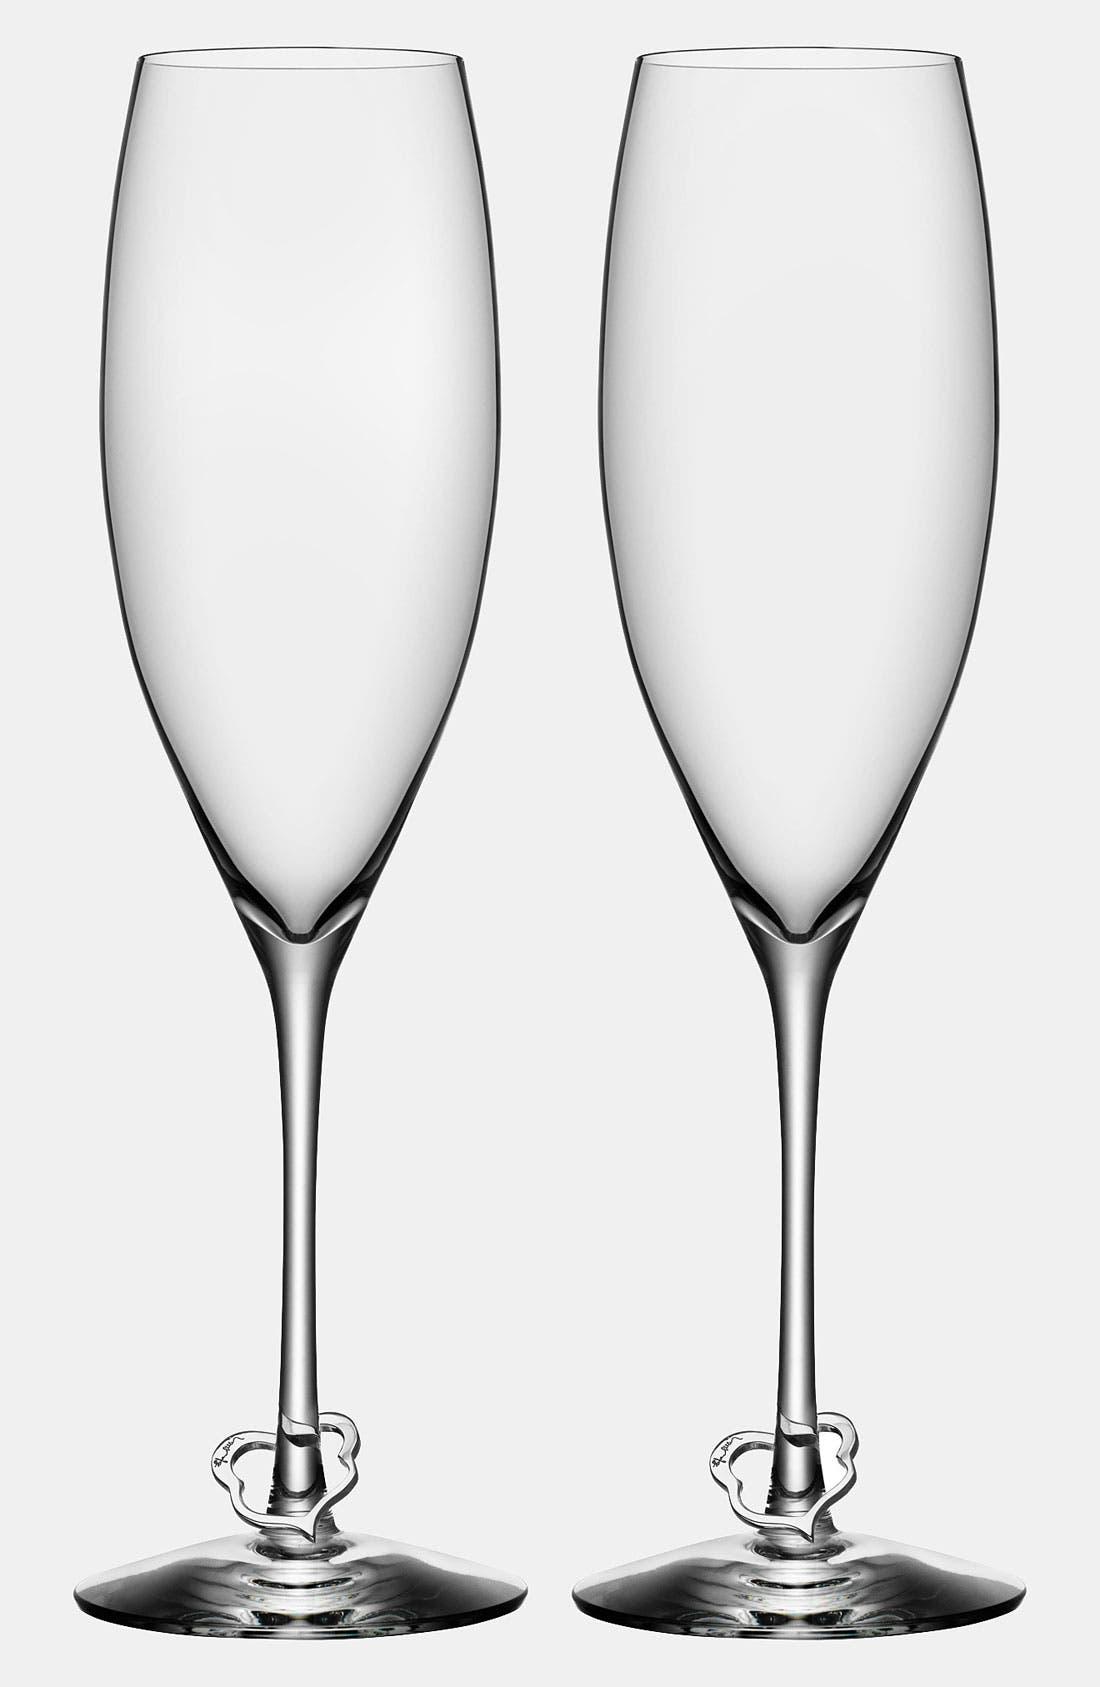 Alternate Image 1 Selected - Orrefors 'Crazy Heart' Champagne Flutes (Set of 2)